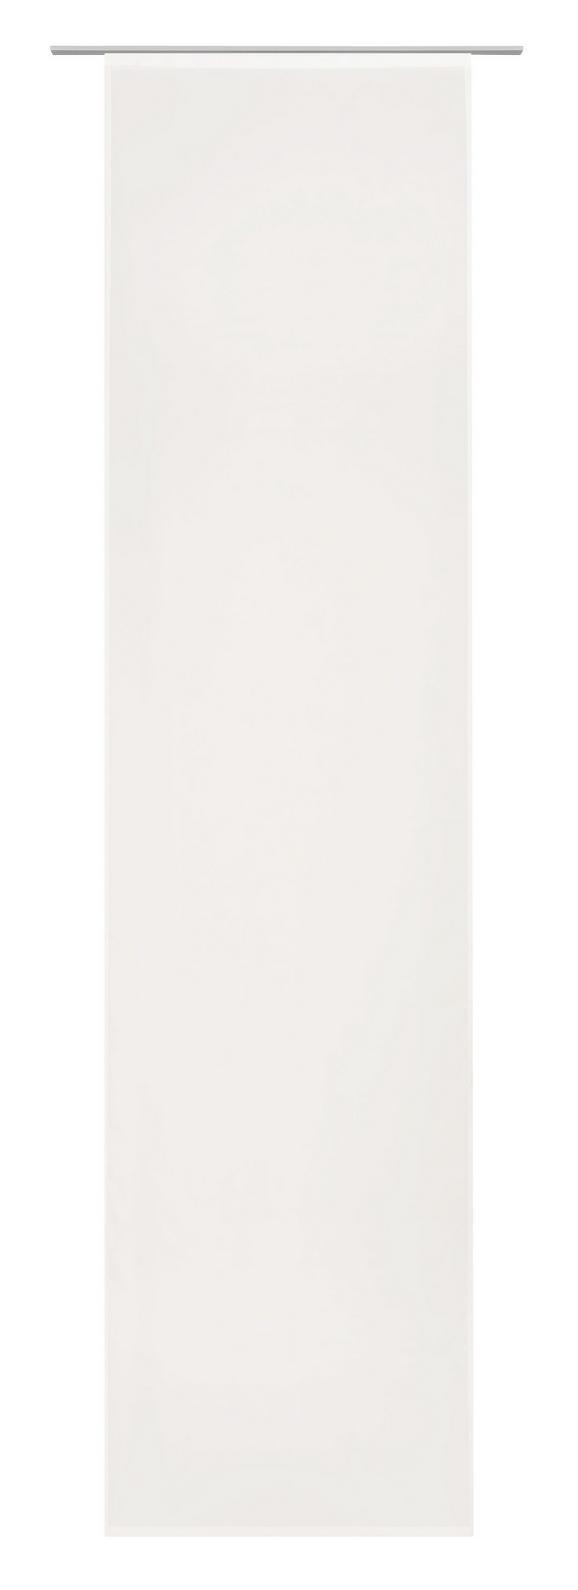 Flächenvorhang Flipp, ca. 60x245cm - Creme, Textil (60/245cm) - MÖMAX modern living